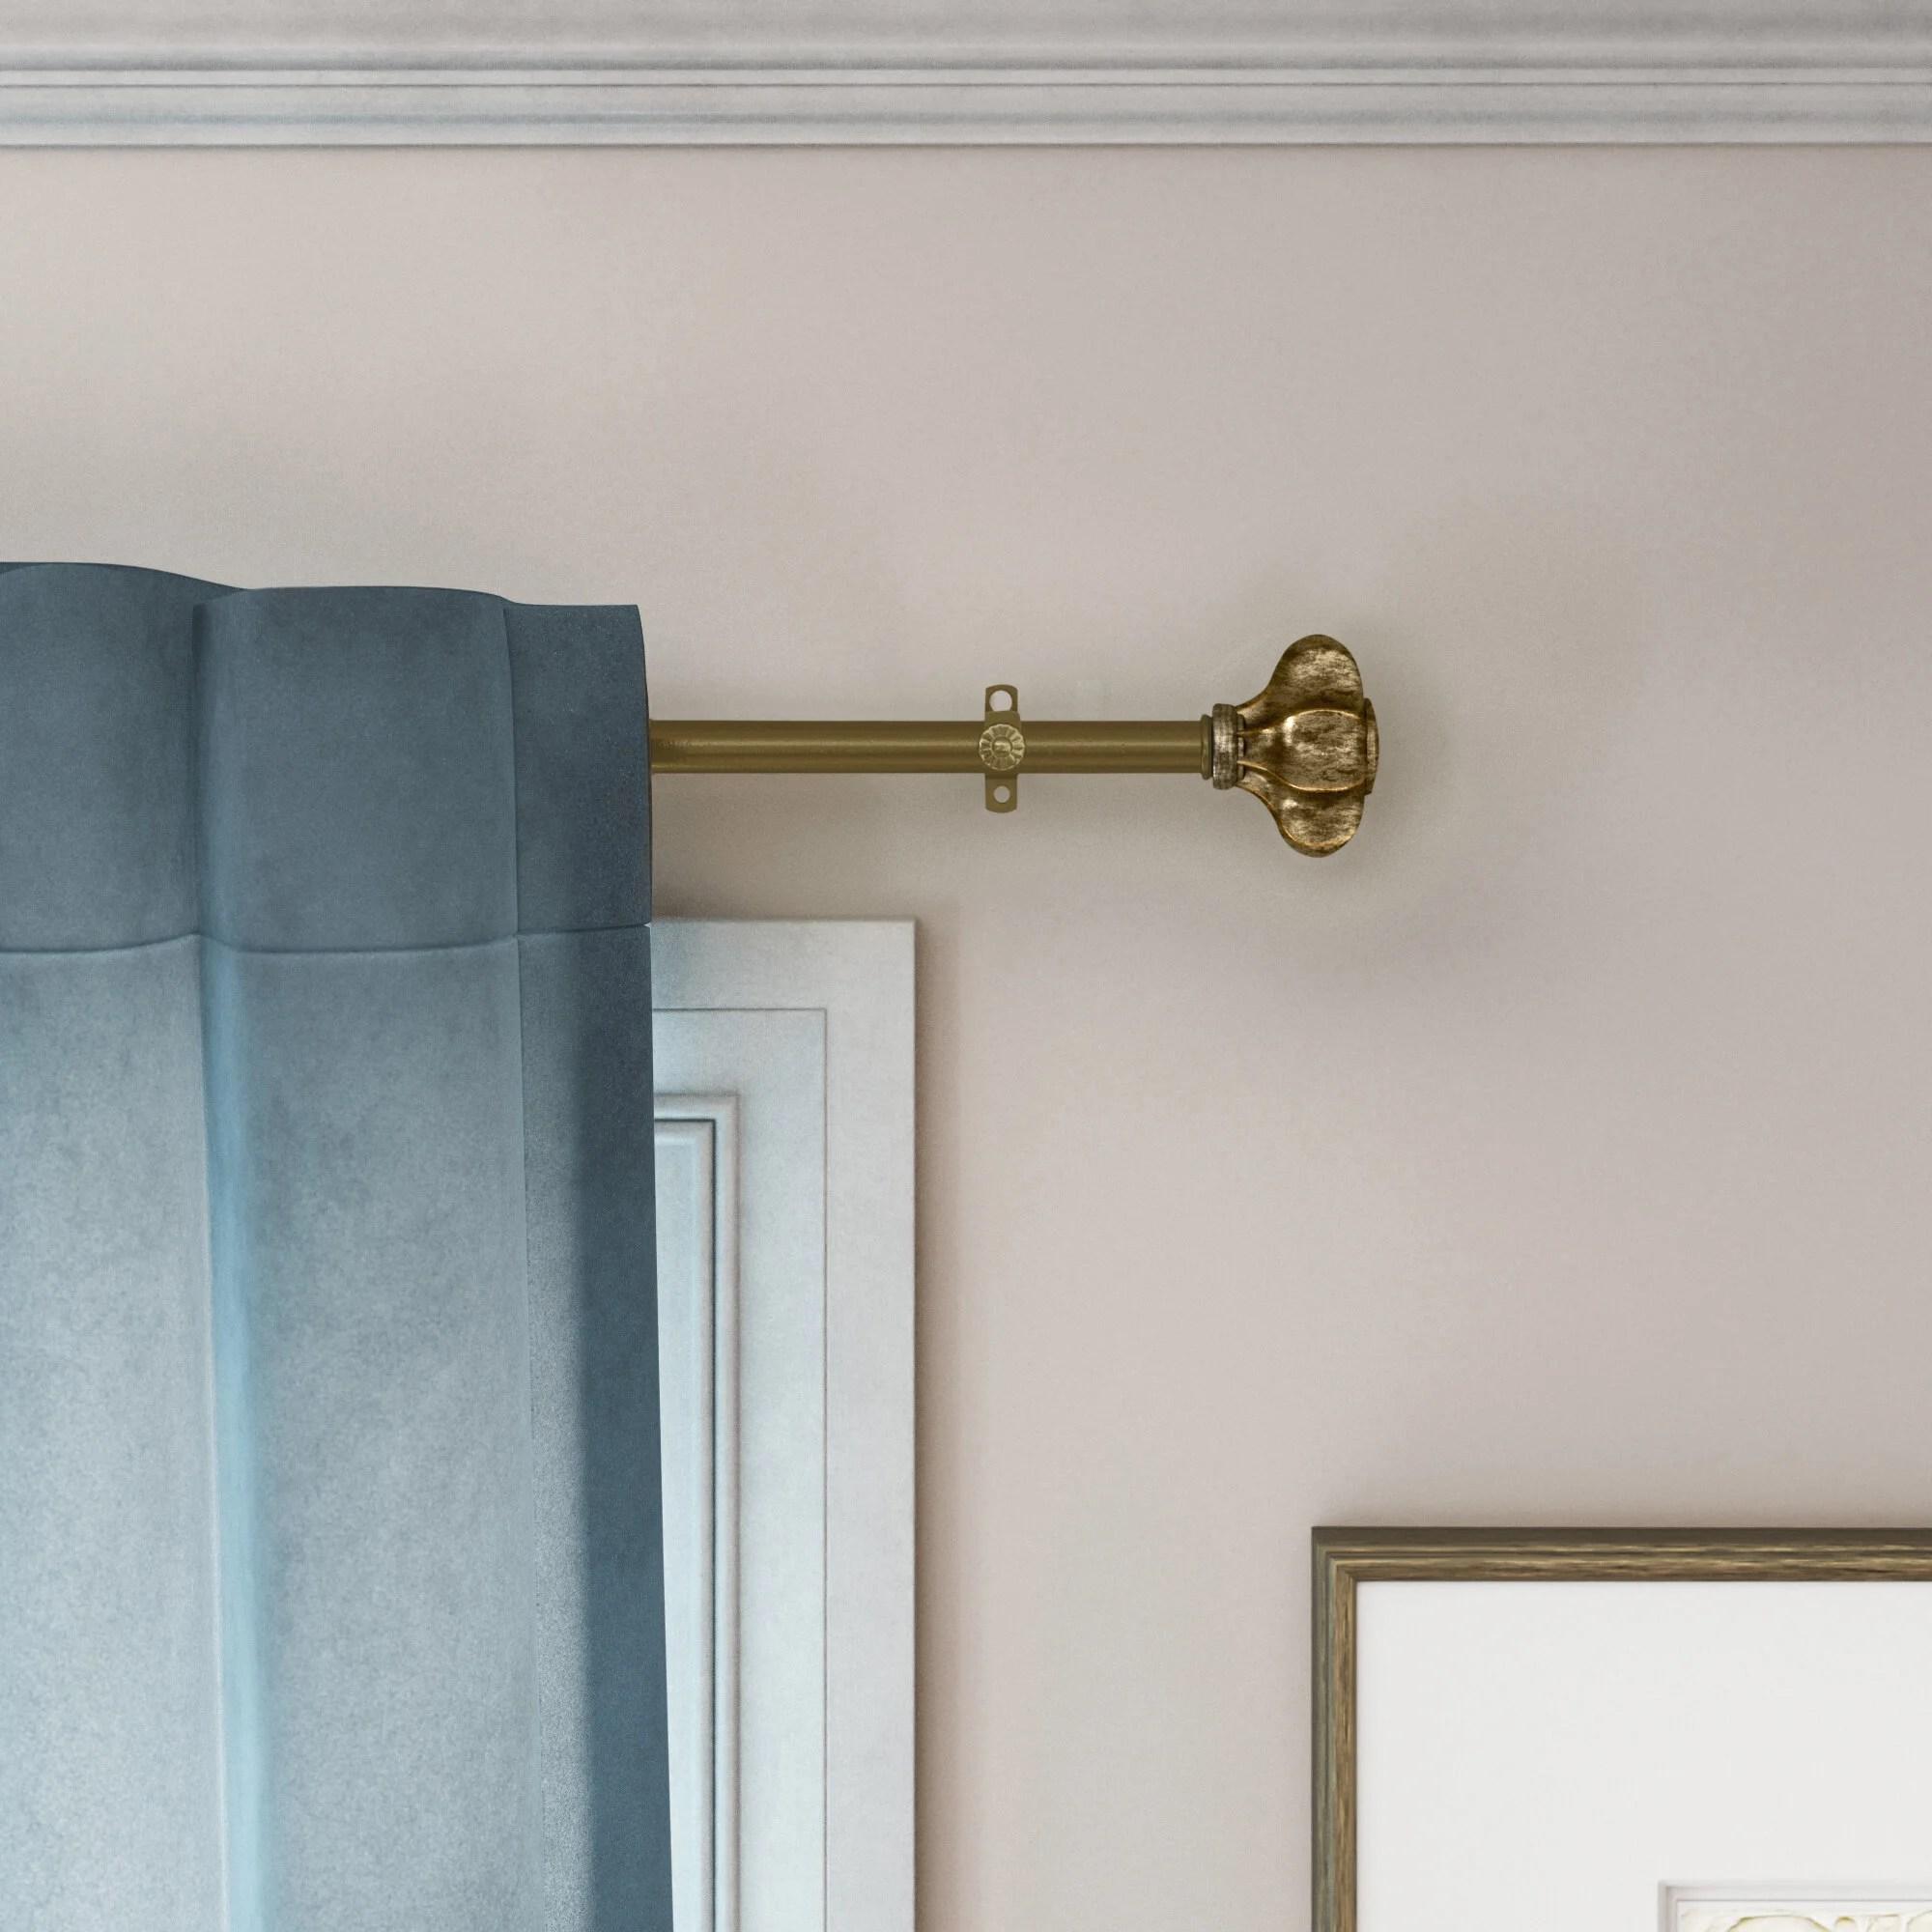 corner rod curtain hardware